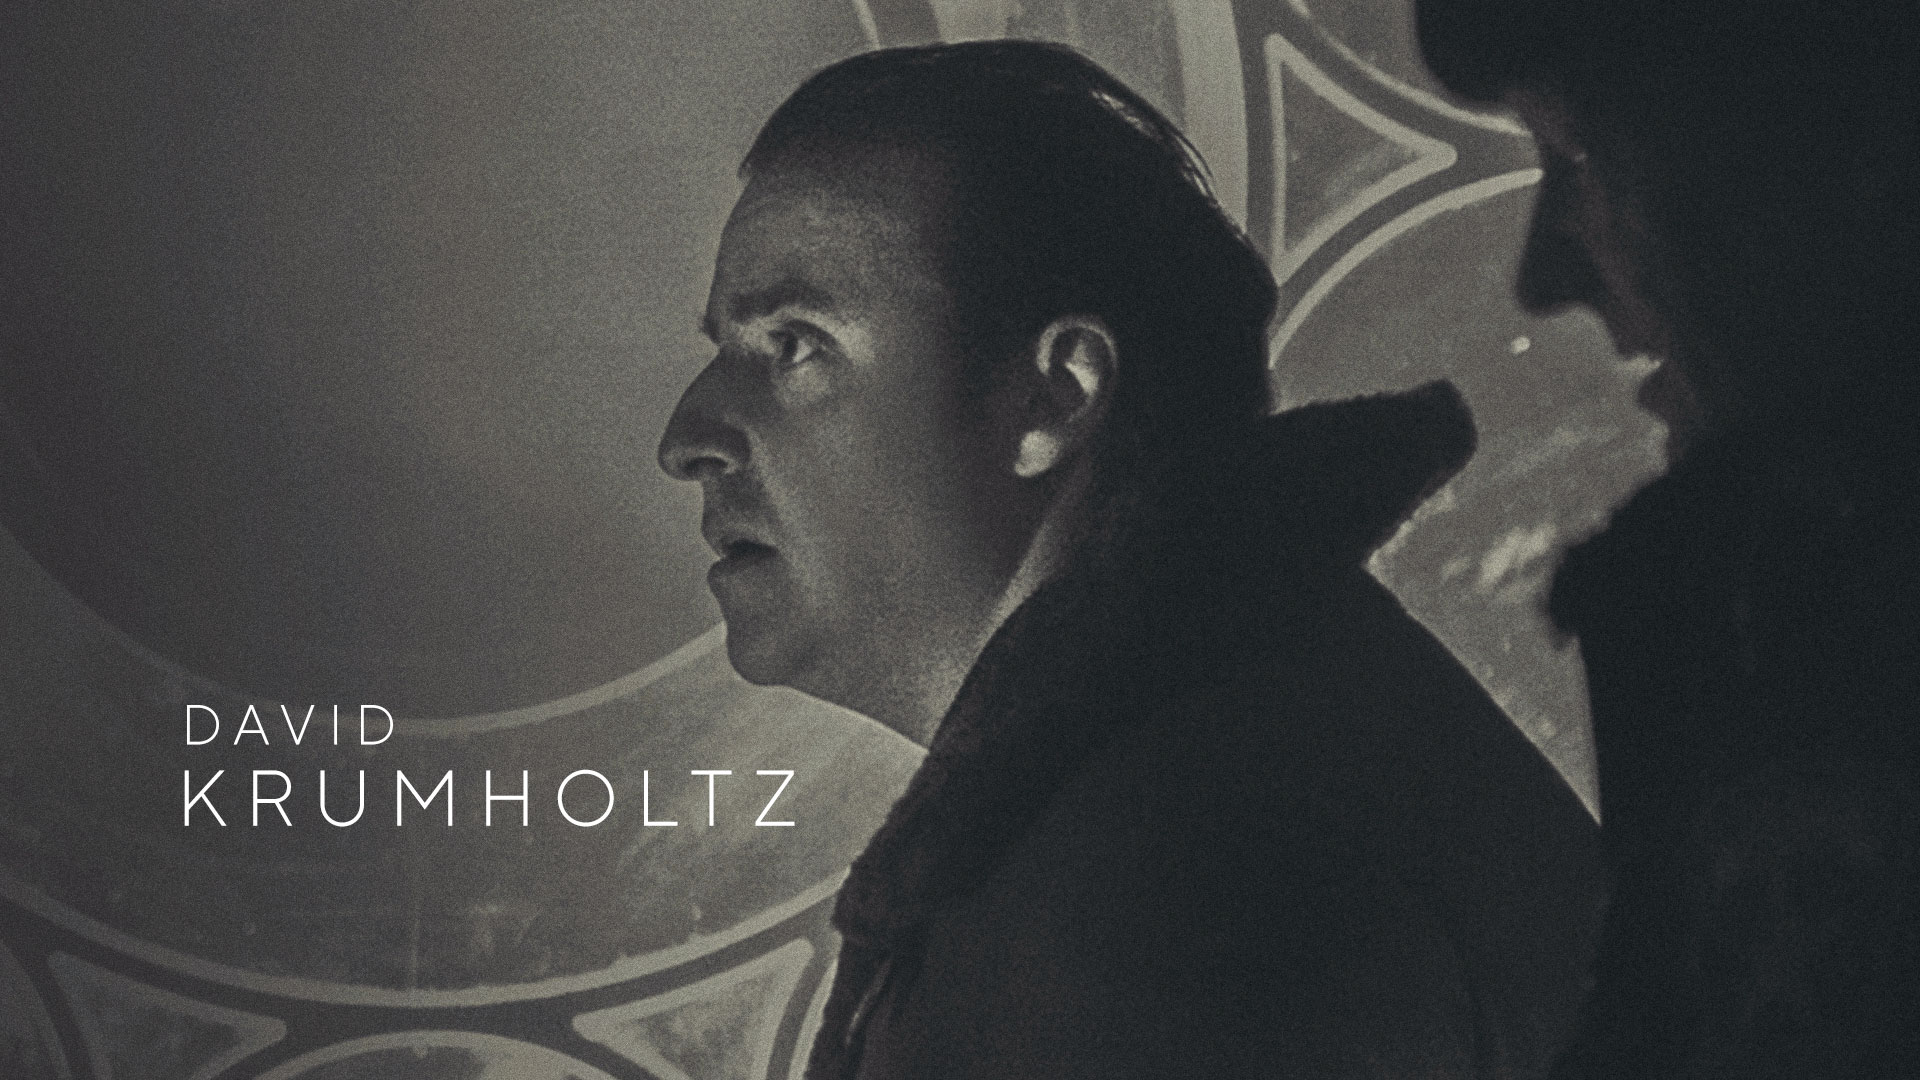 David Krumholtz as Mayor Conley in